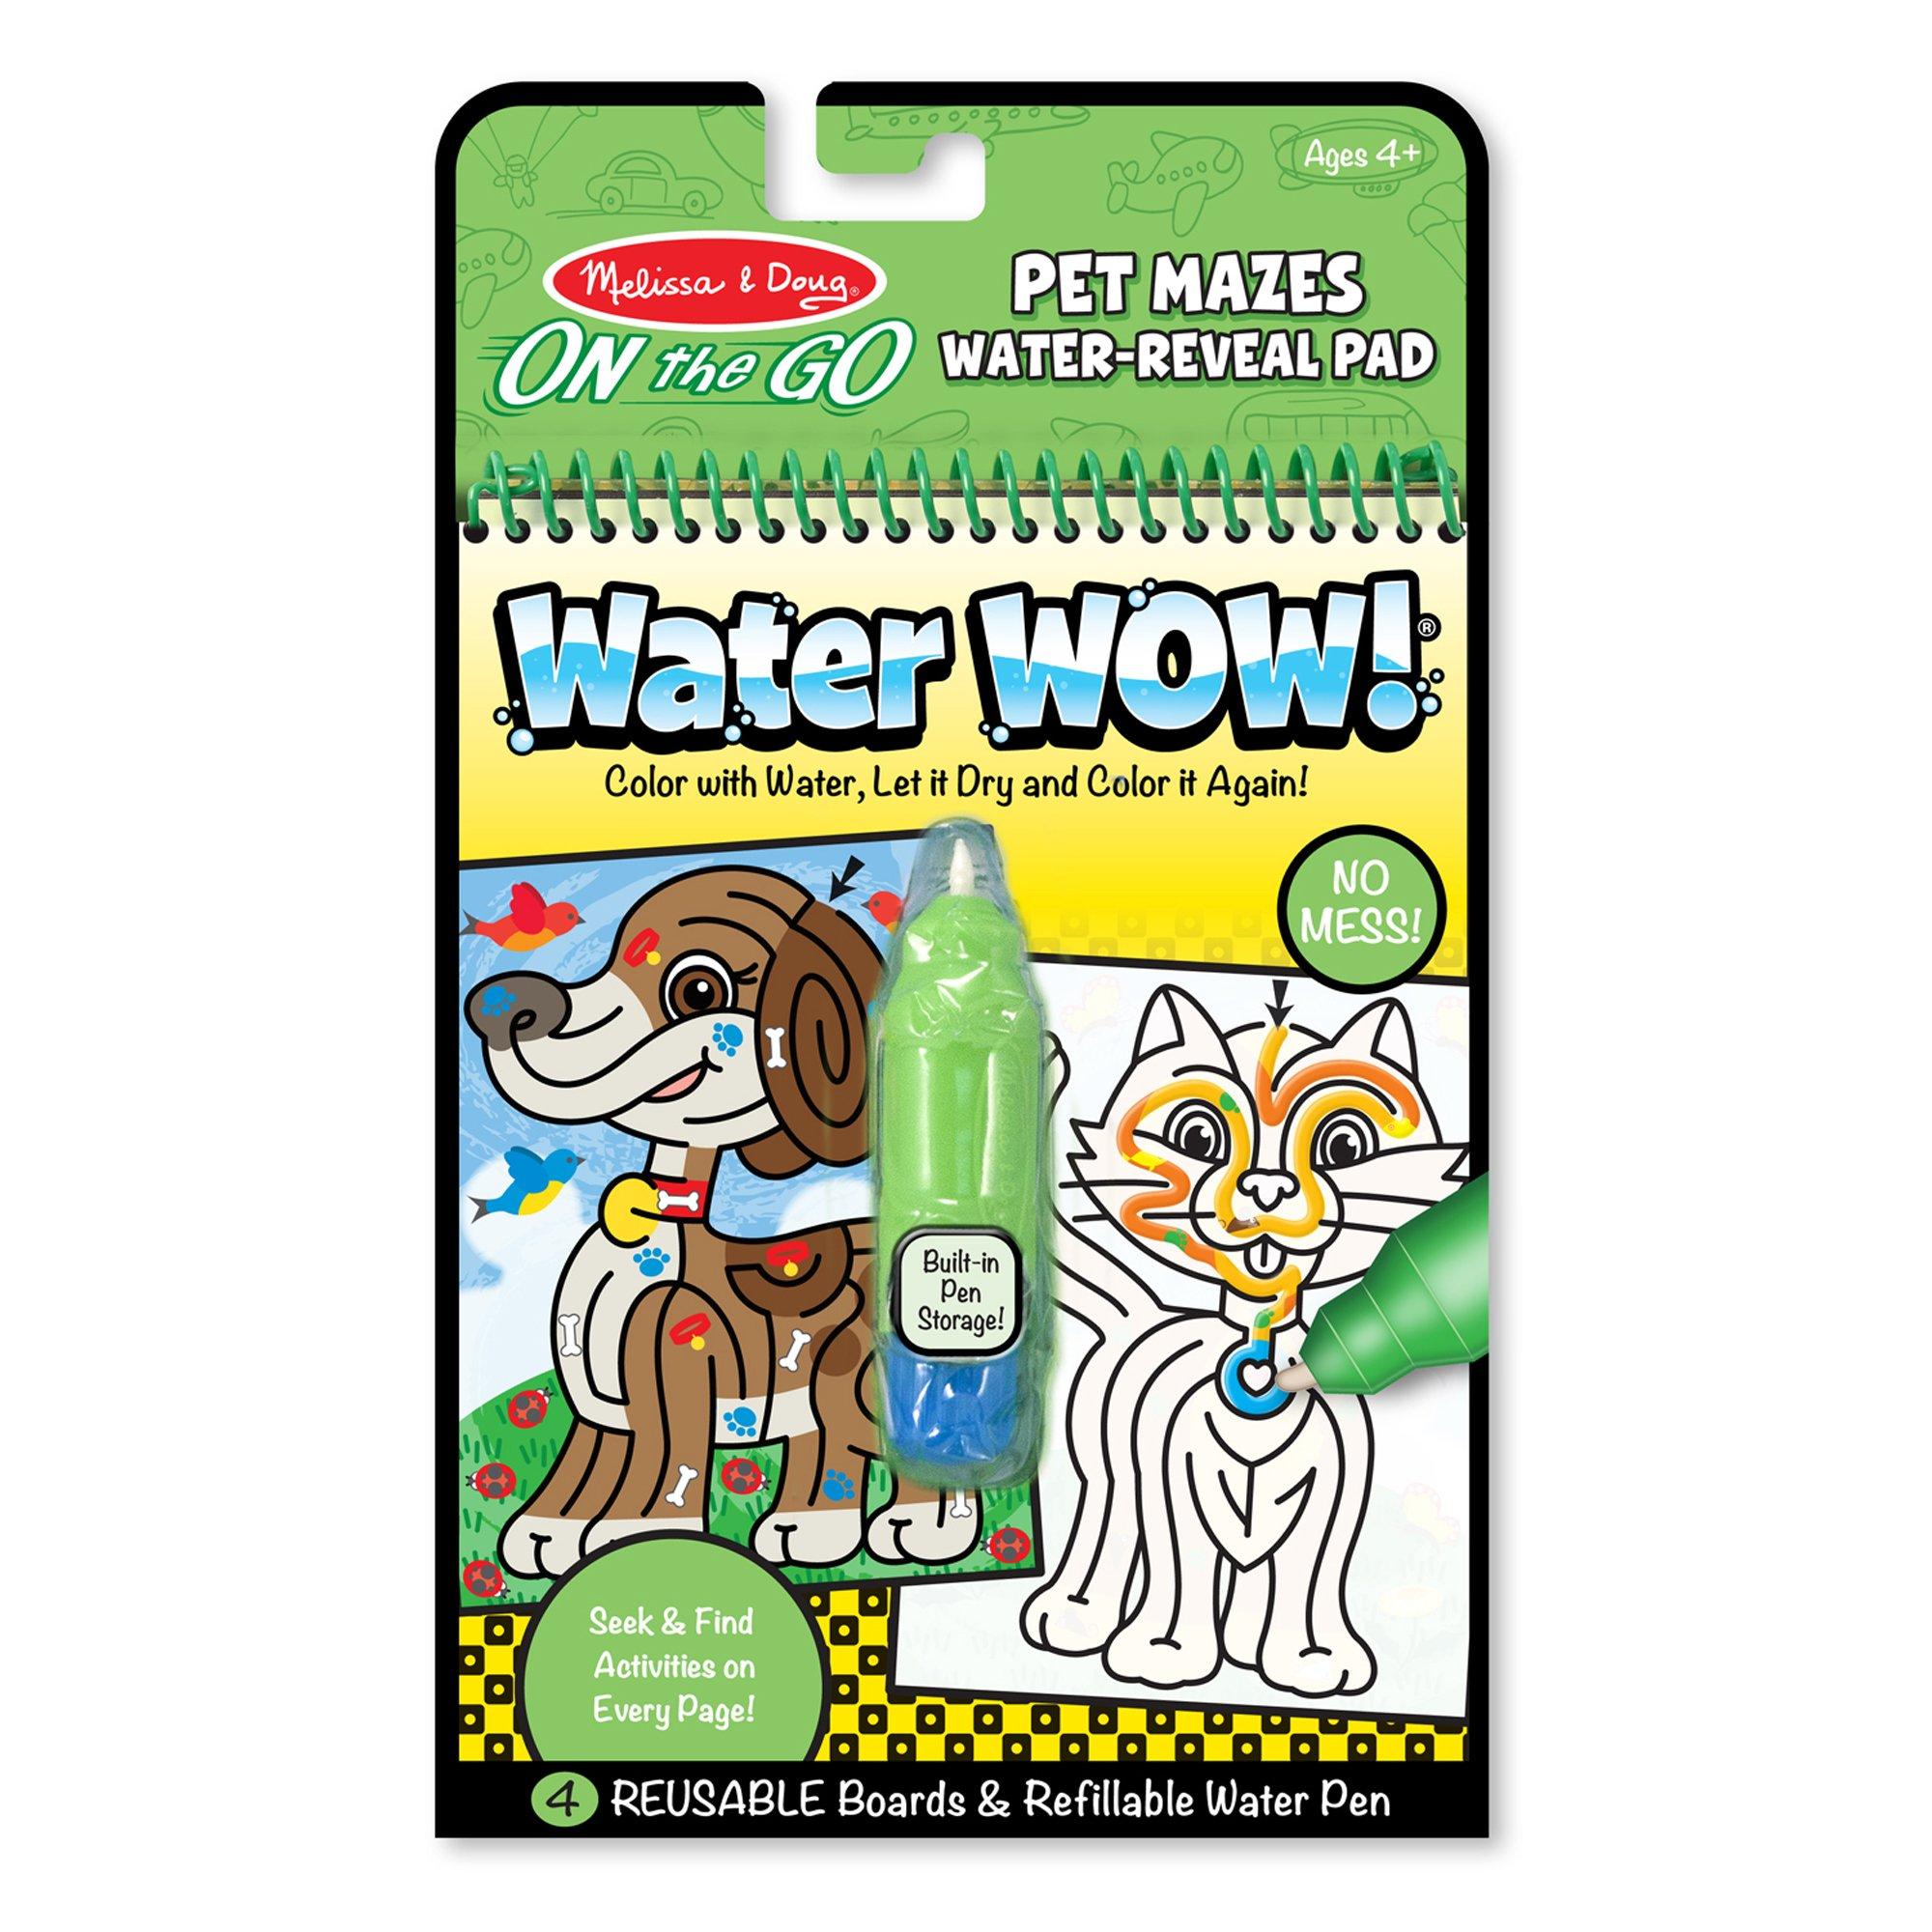 WATER WOW, PET MAZES